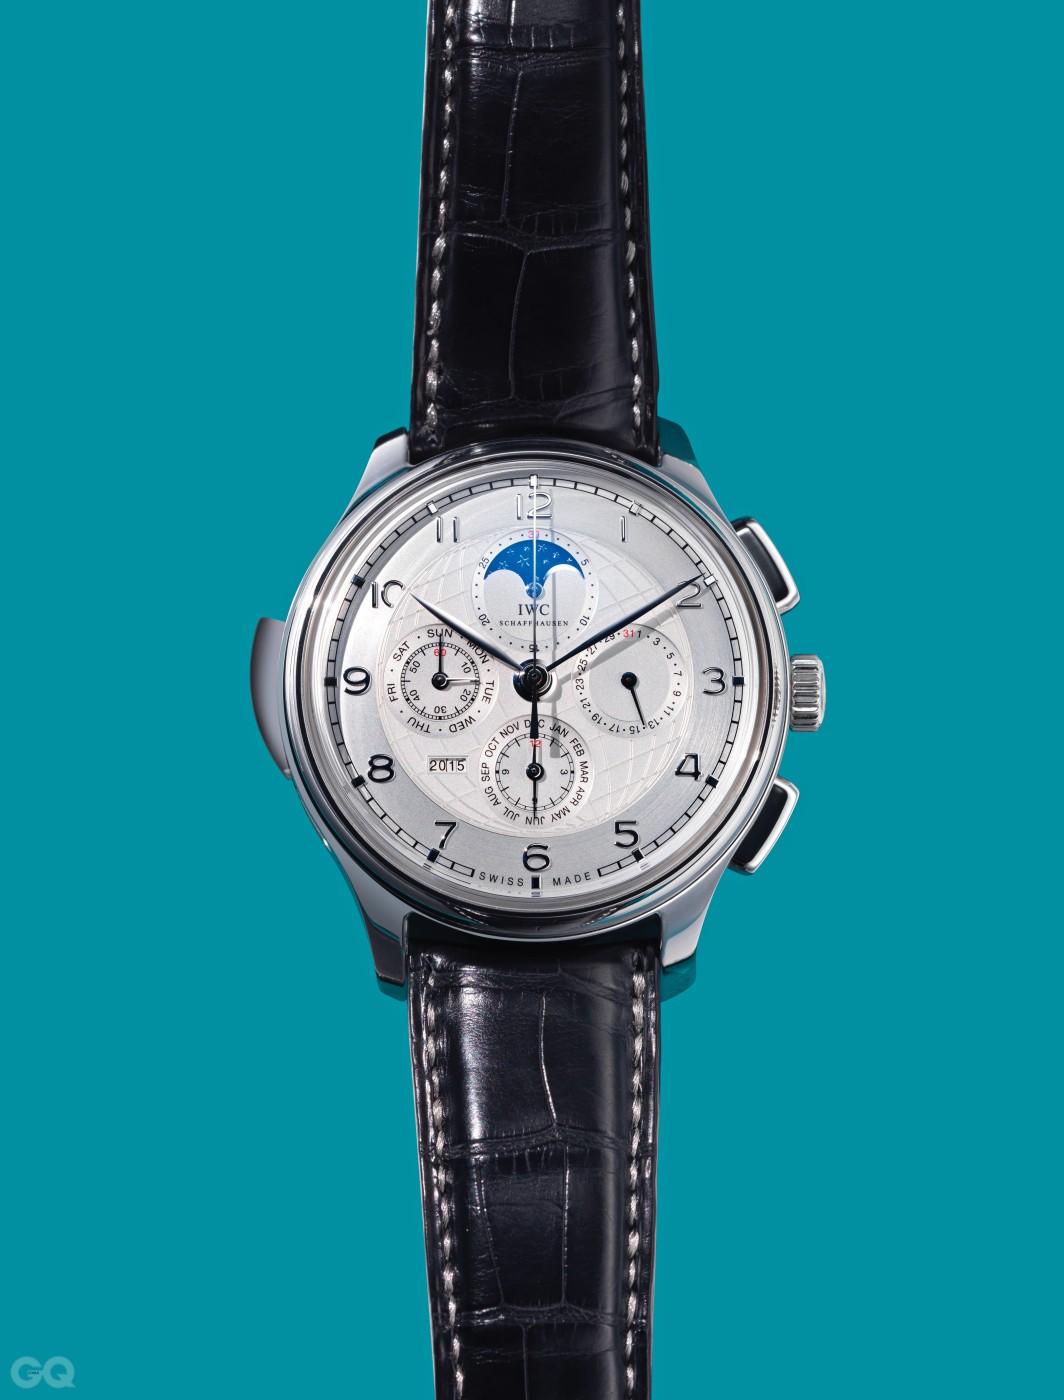 160205 GQ(watch)_10278